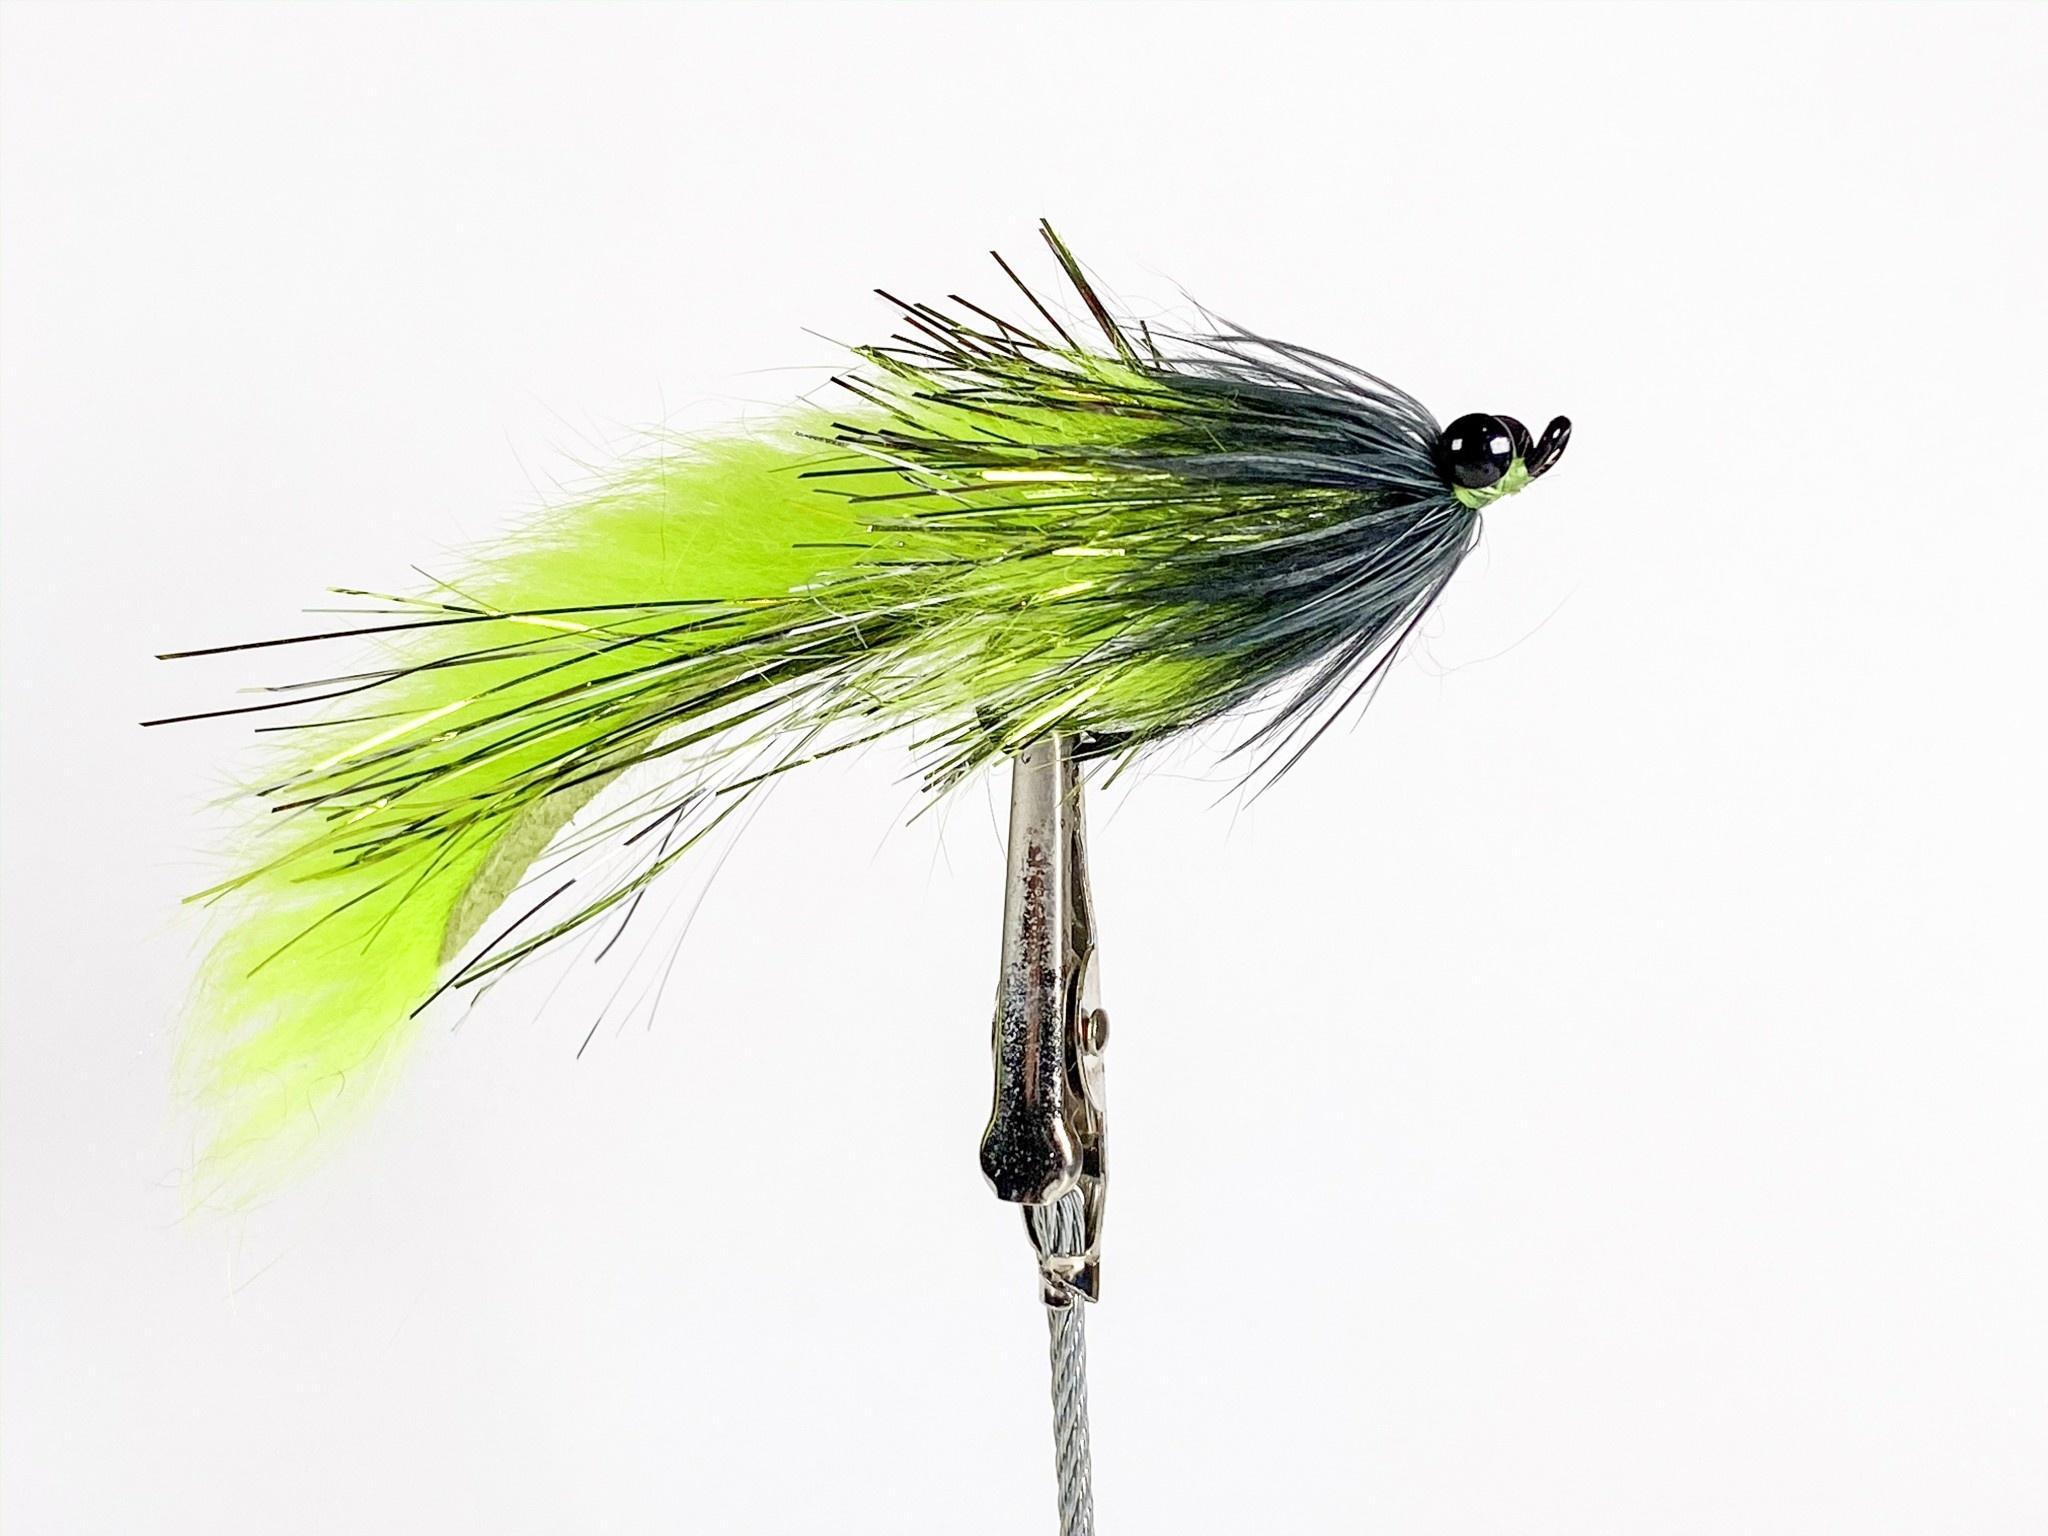 Aqua Flies Hareball Leech size 1/0